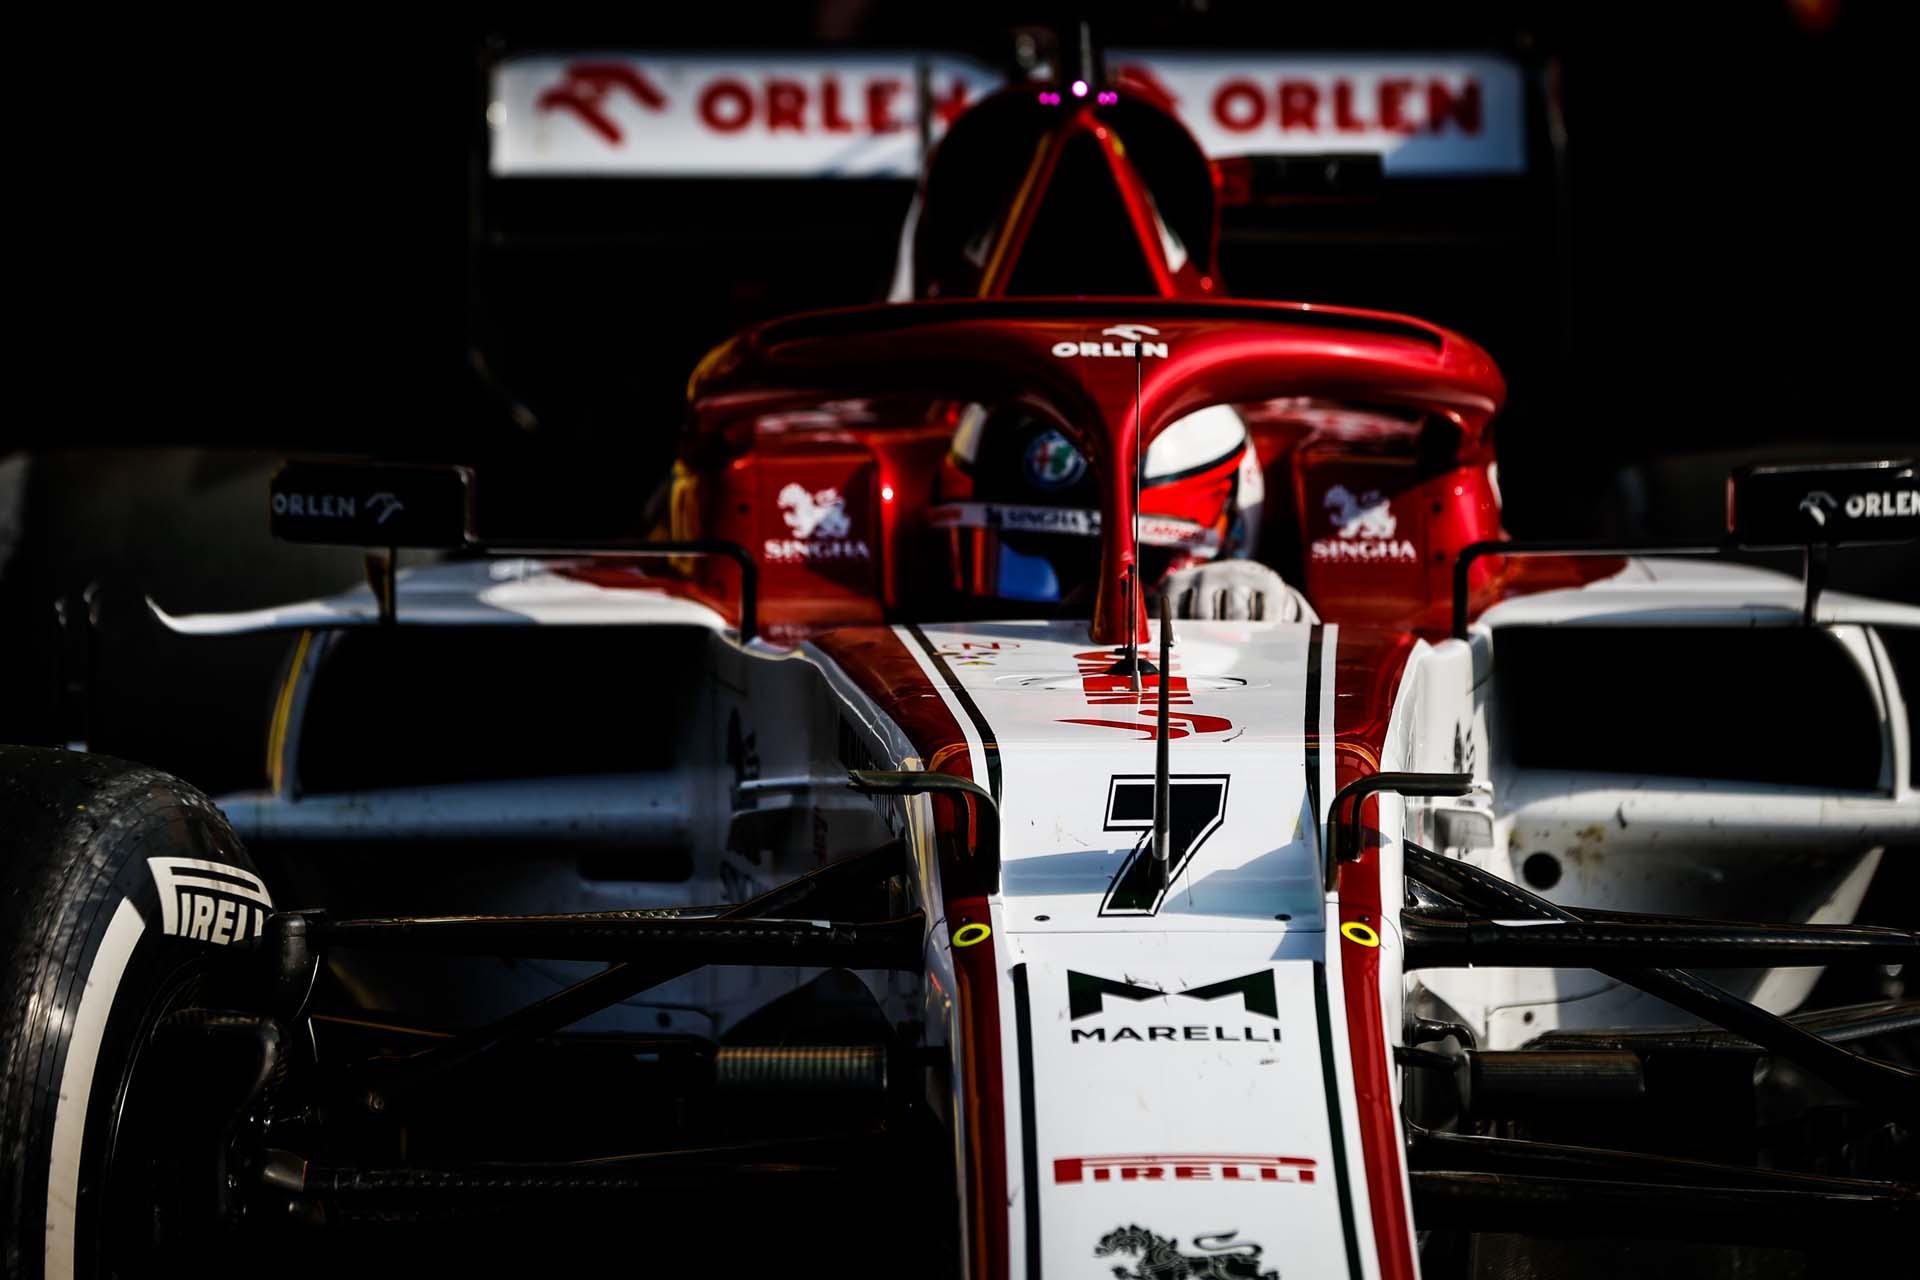 F1 - TUSCAN GRAND PRIX 2020